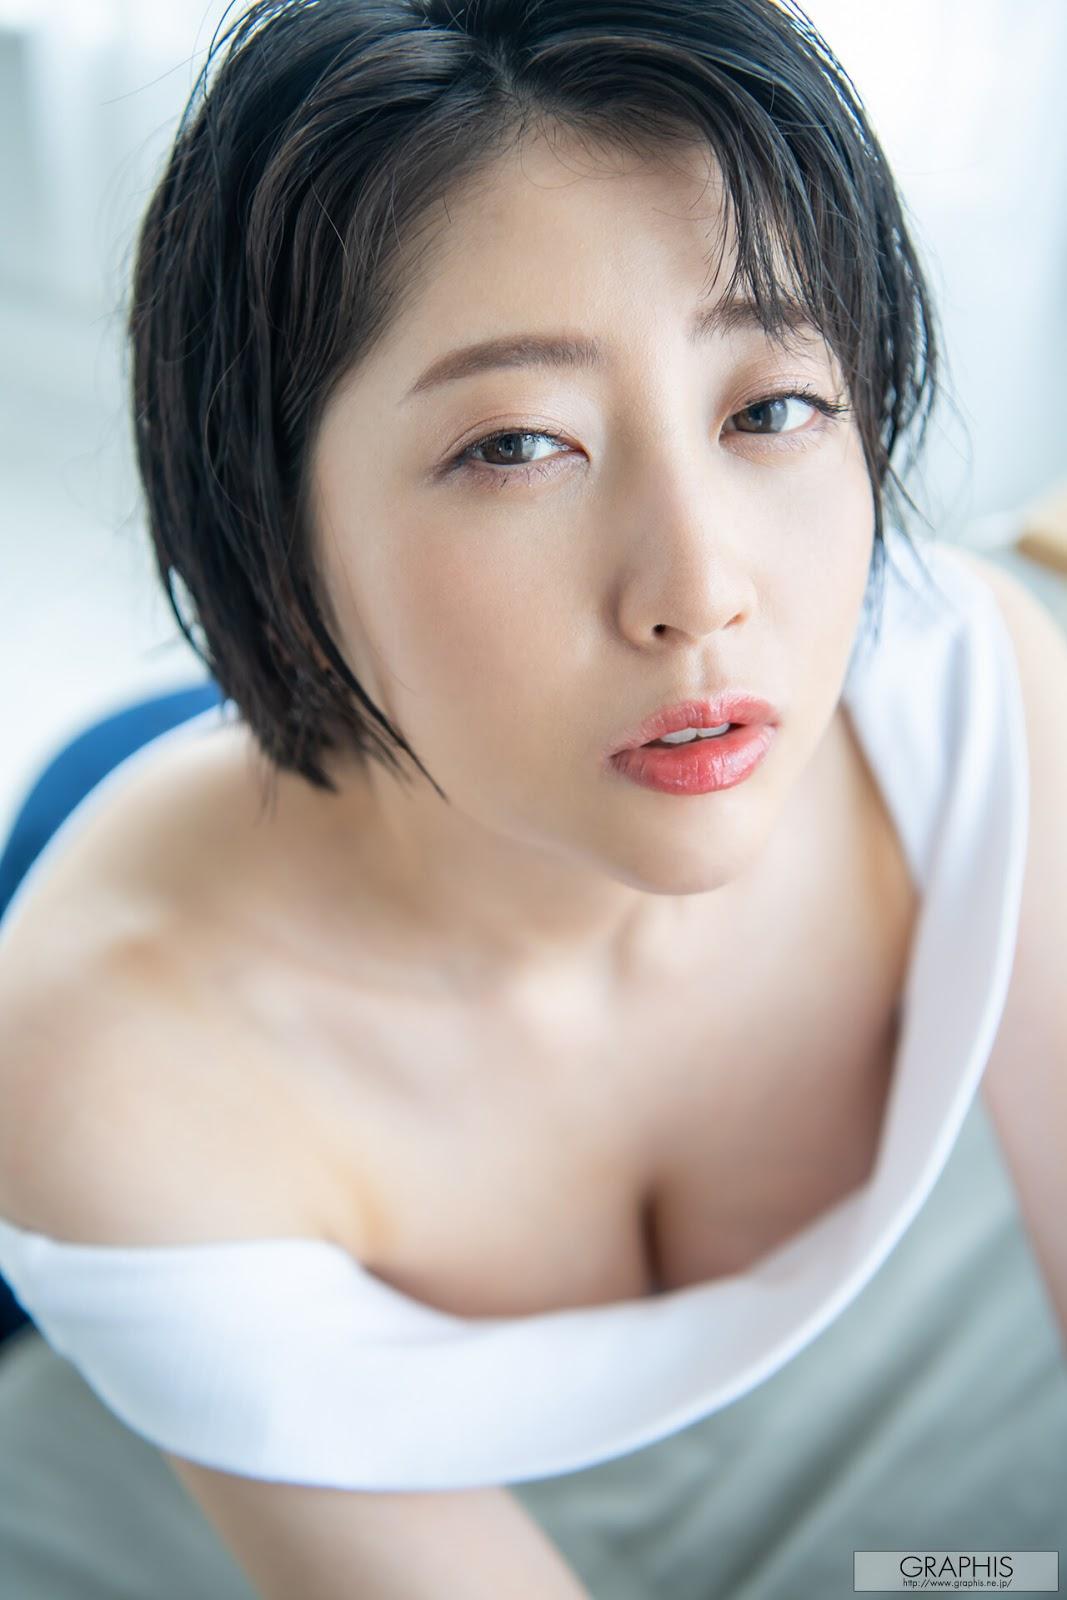 [graphis gals]无圣光高清图集: Hibiki Natsume 夏目響, 精致短发妹